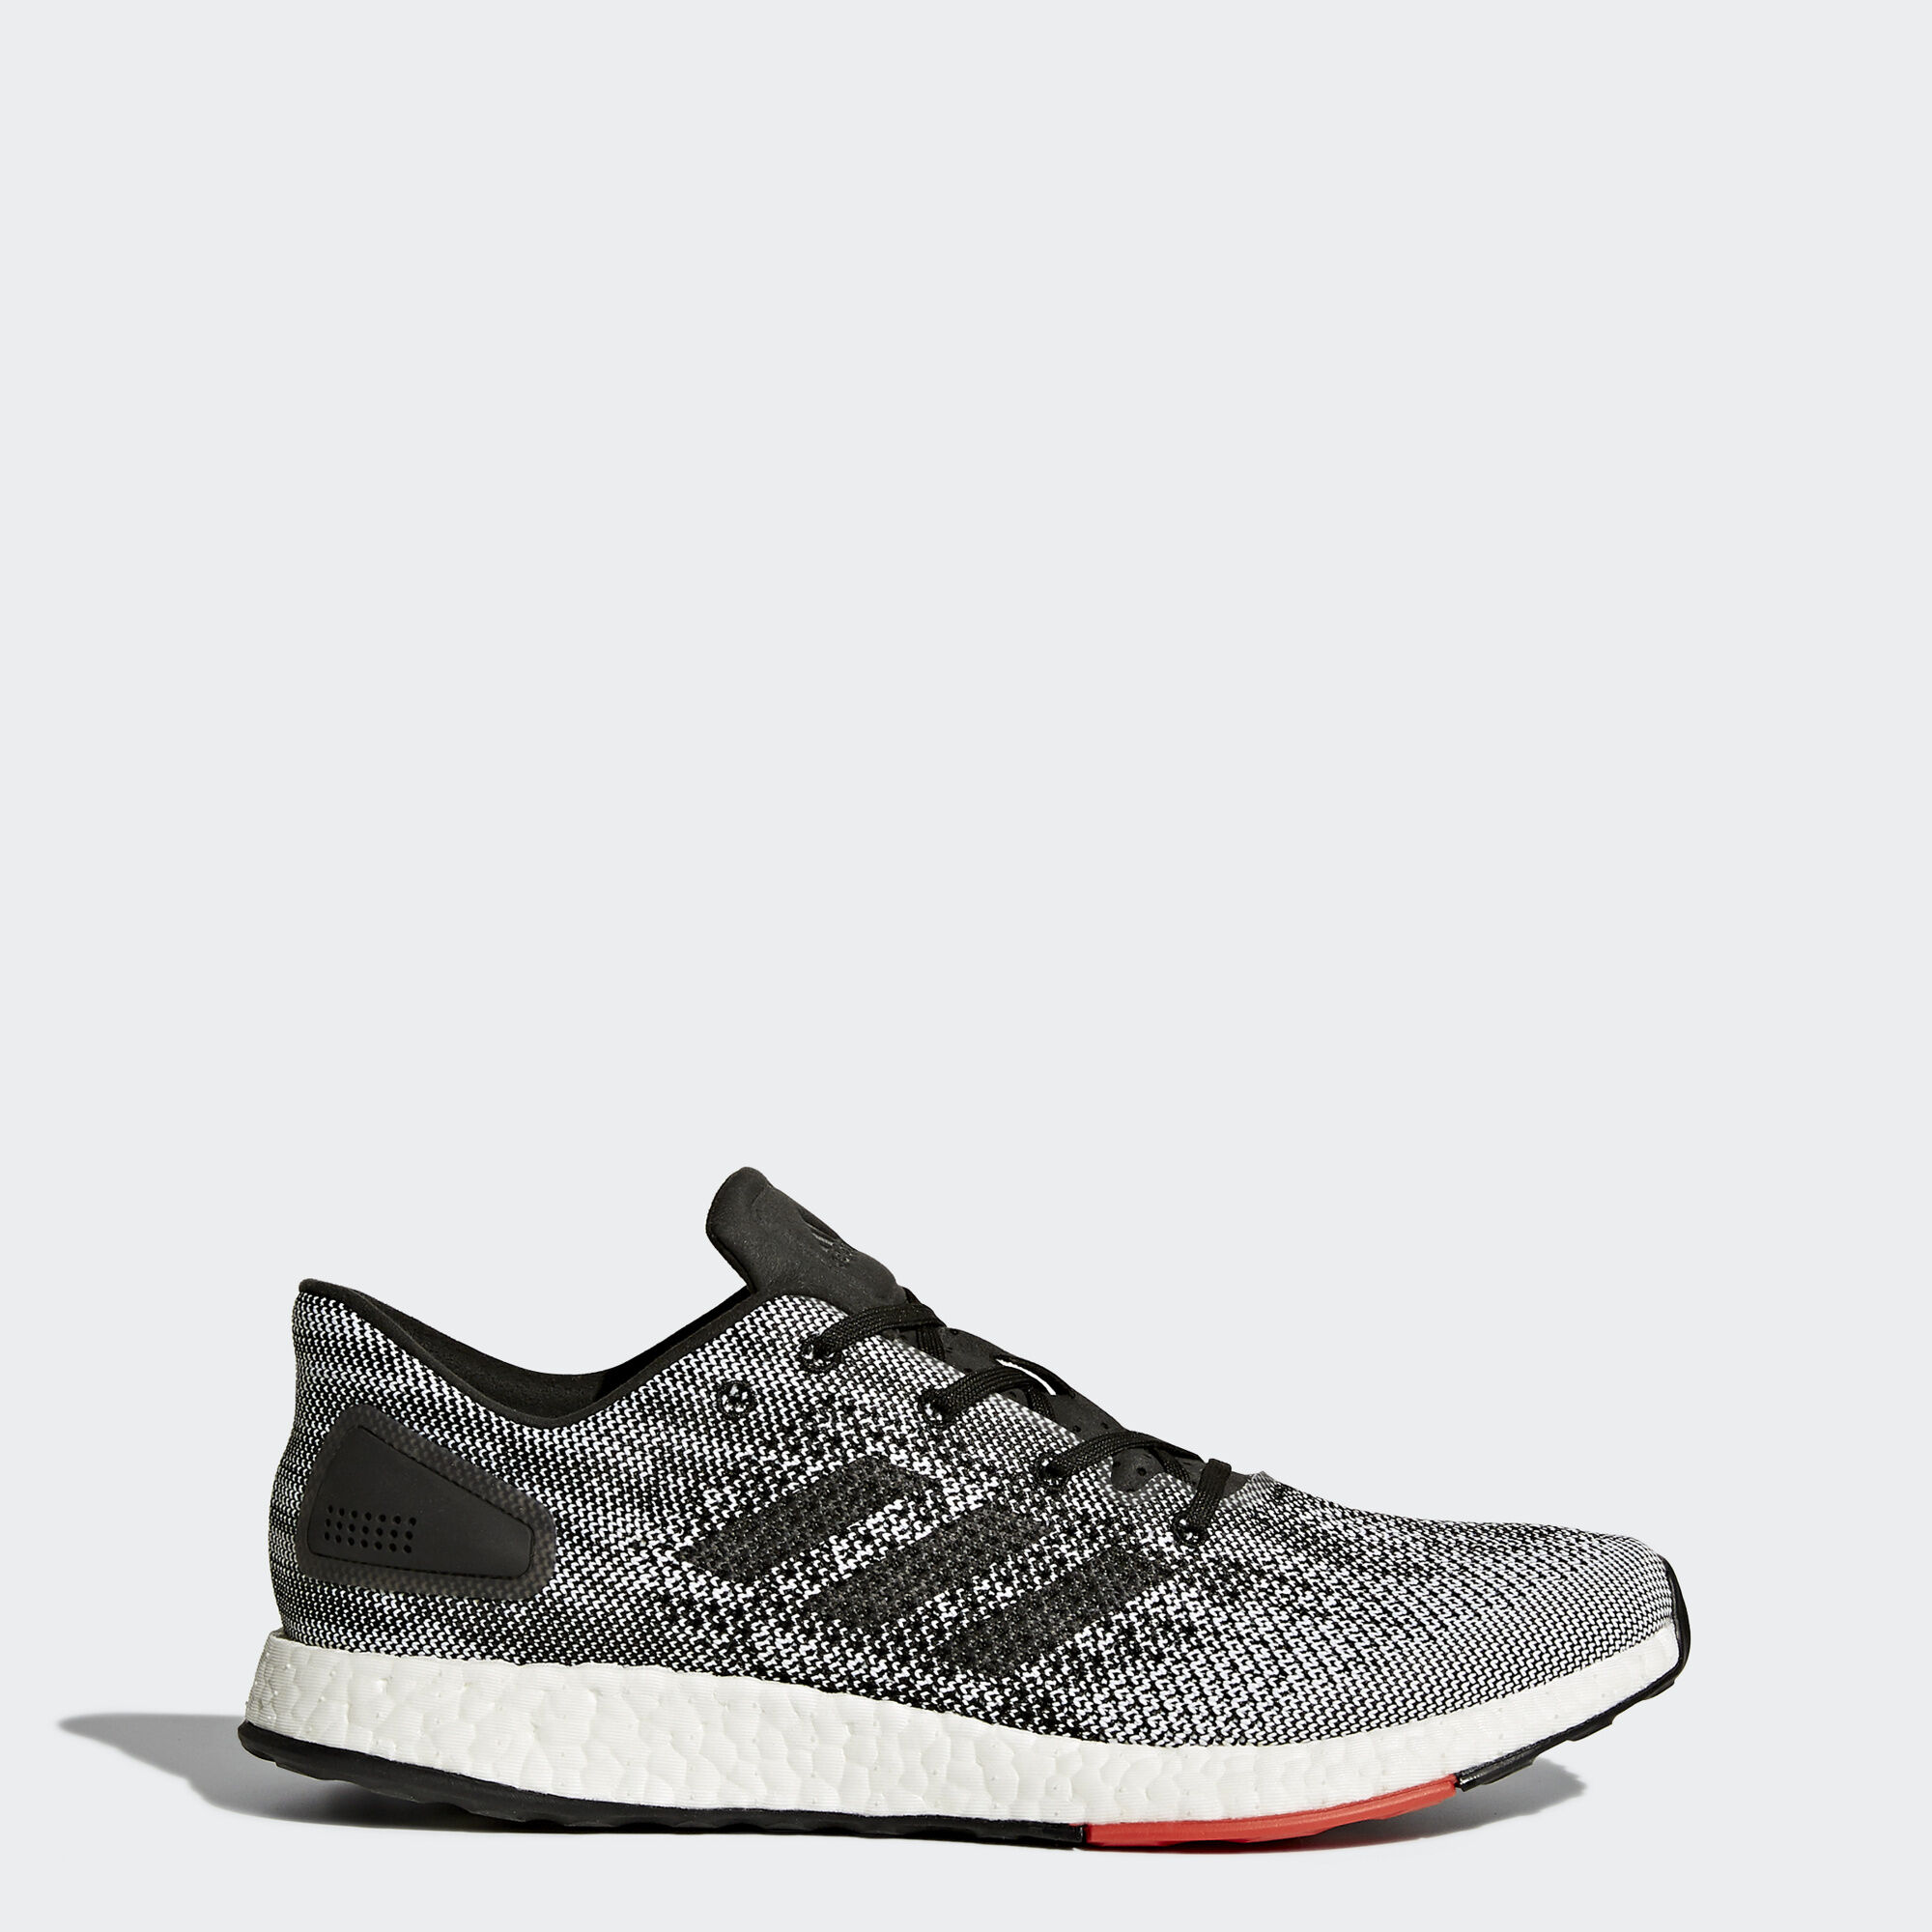 adidas long shoes black